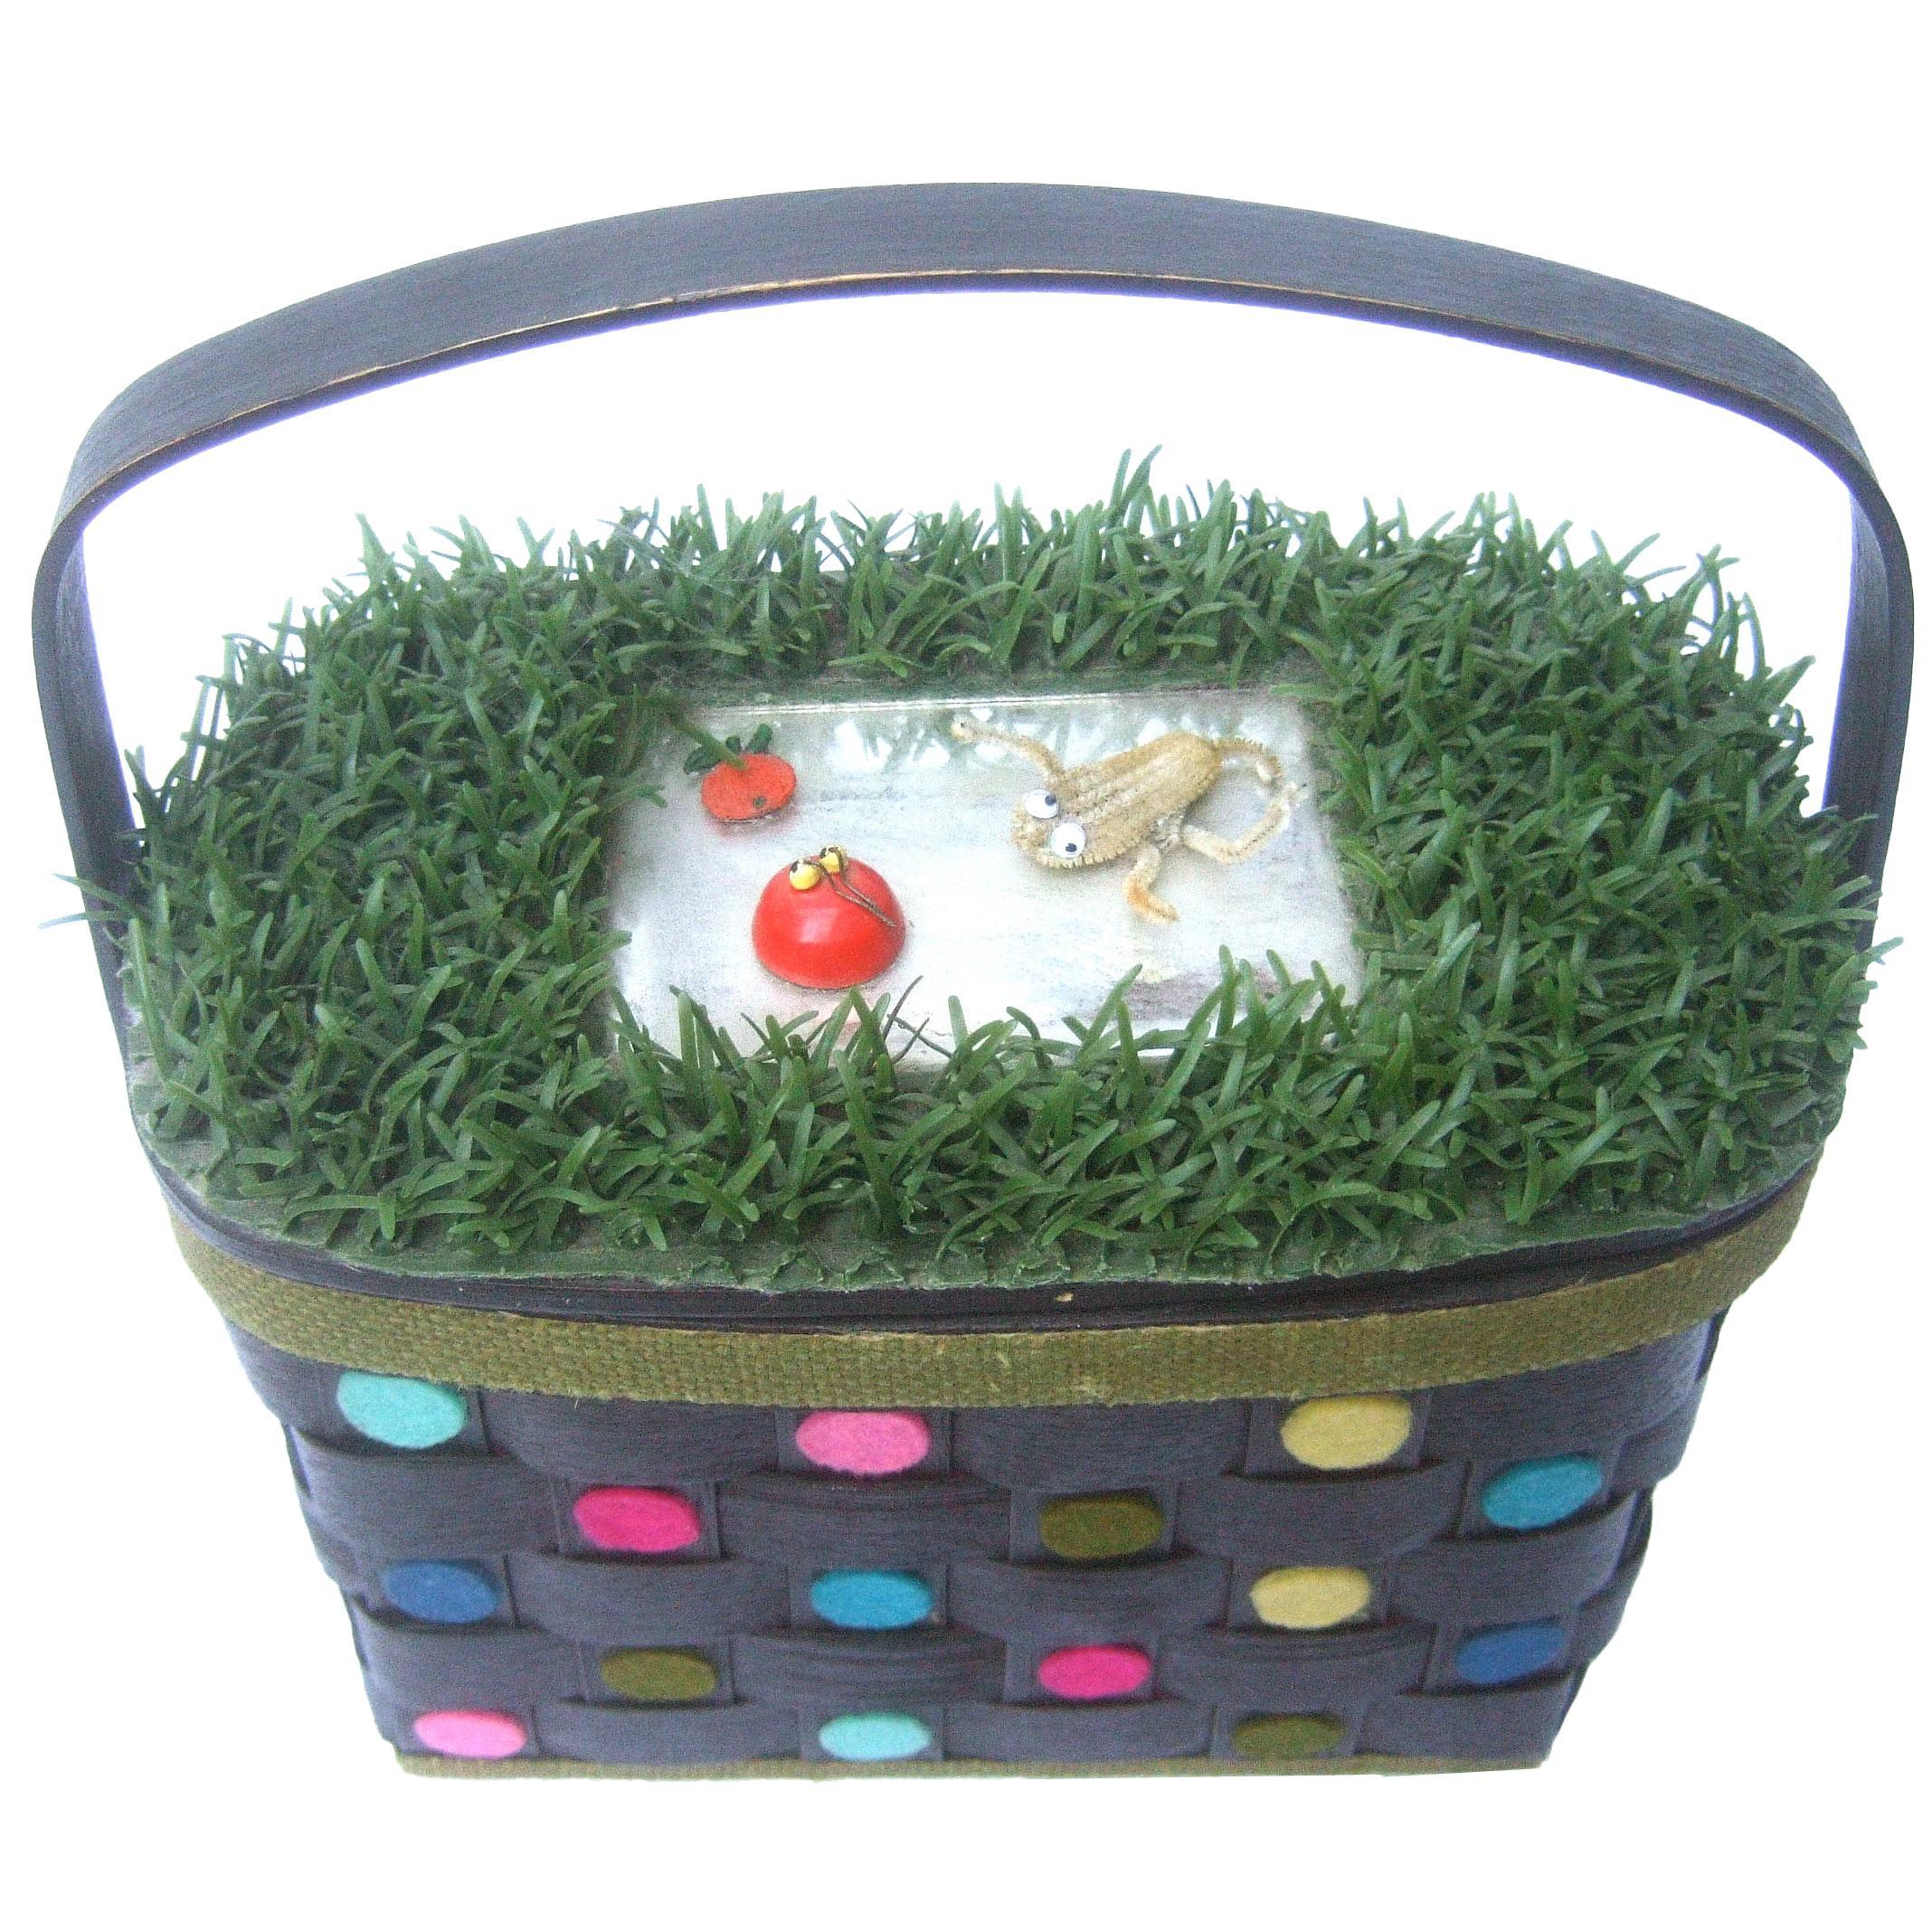 Whimsical Quirky Astro Turf  Wicker Handmade Basket Purse circa 1970